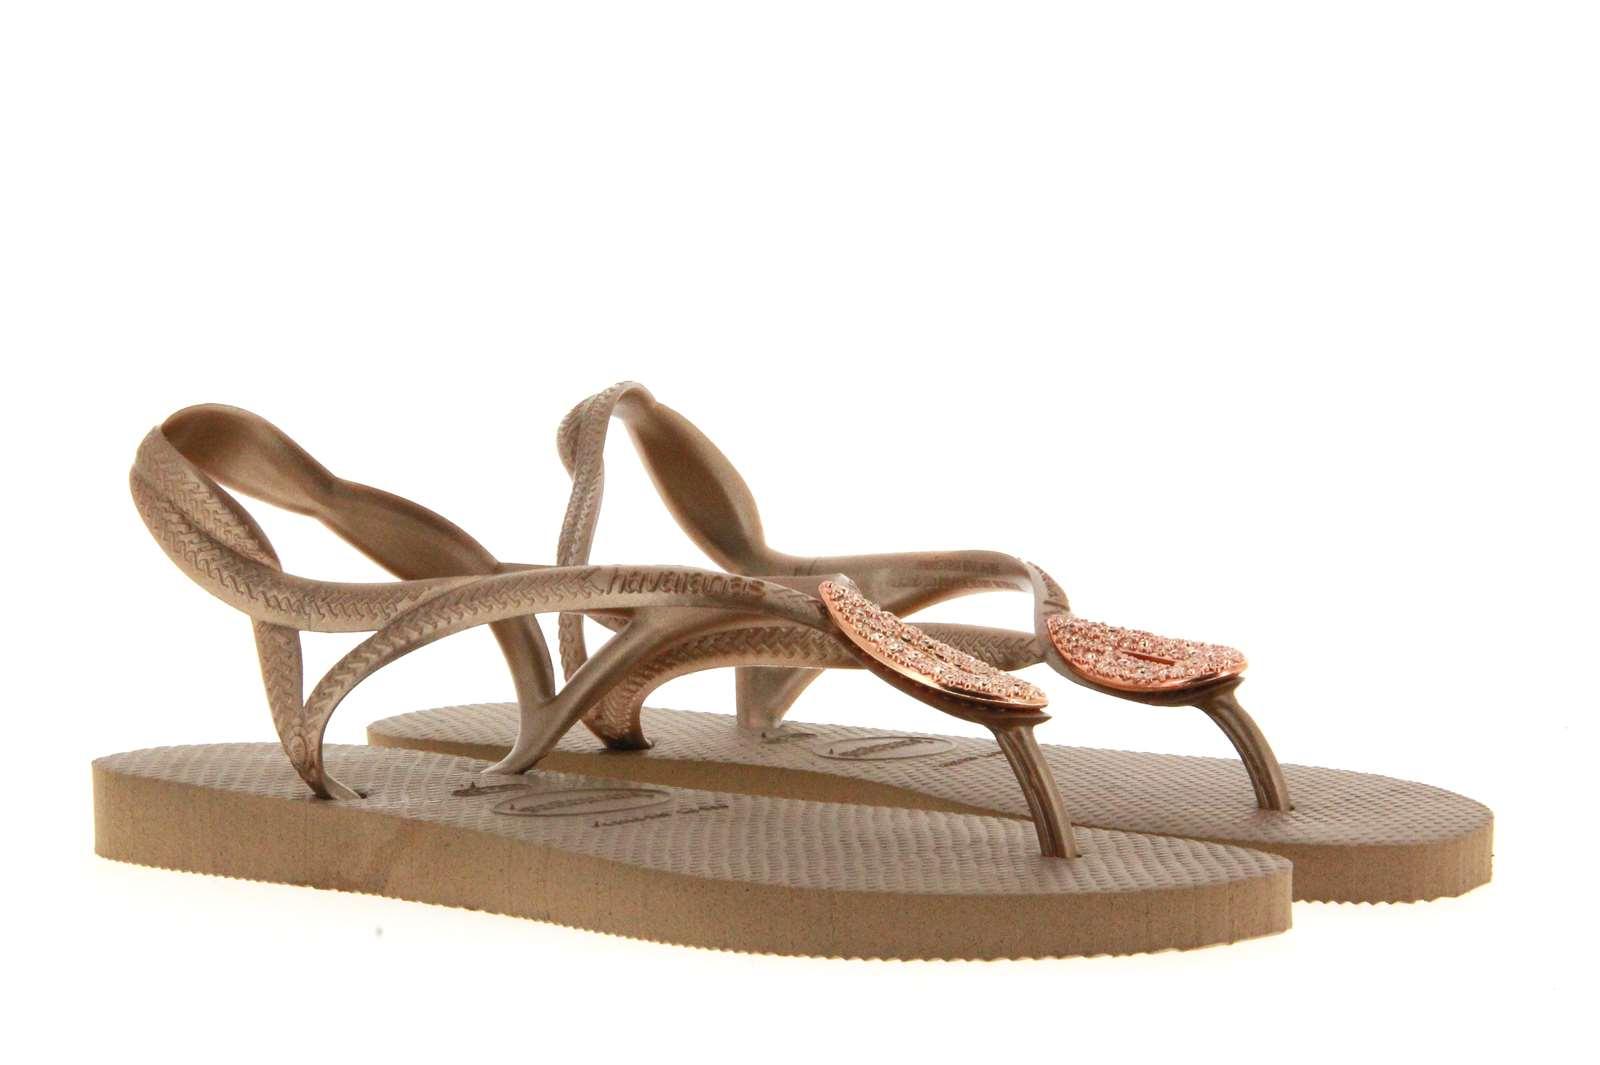 Havaianas toe sandals LUNA SPECIAL ROSE GOLD